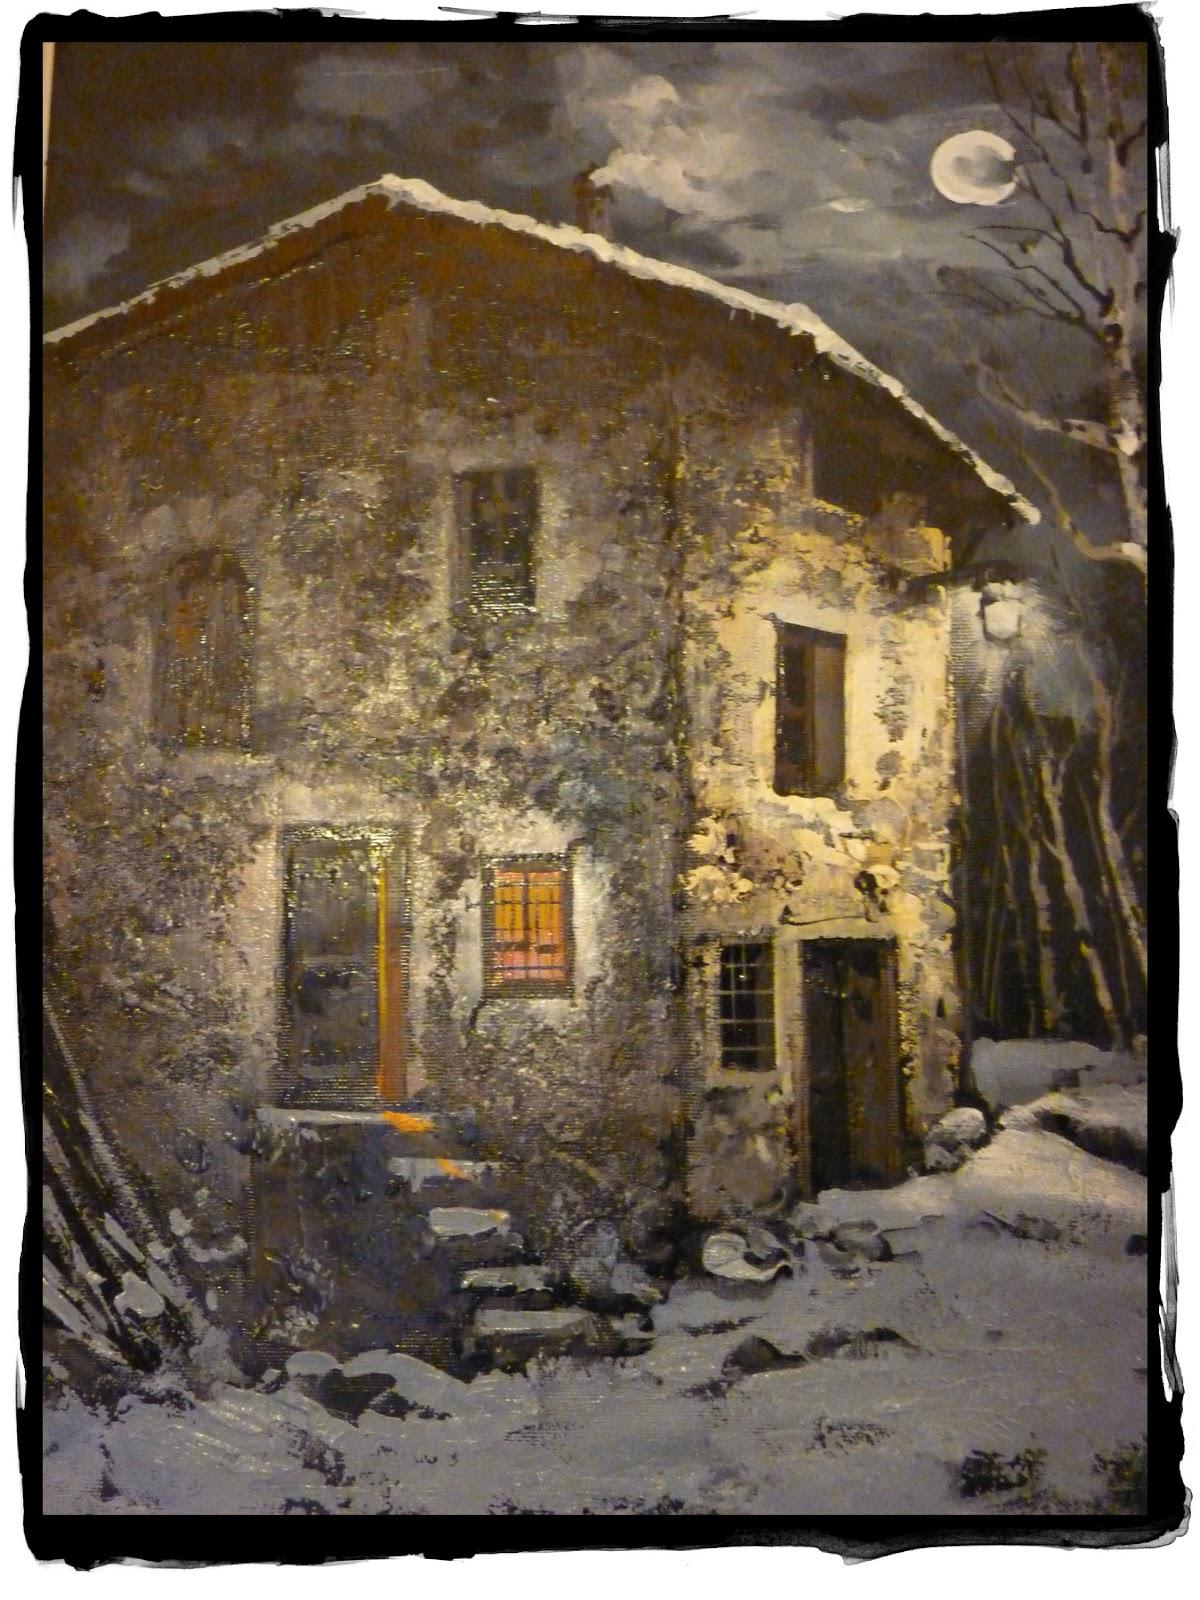 Vita magica di una famiglia alpina case di sassi for Immagini interni case di campagna